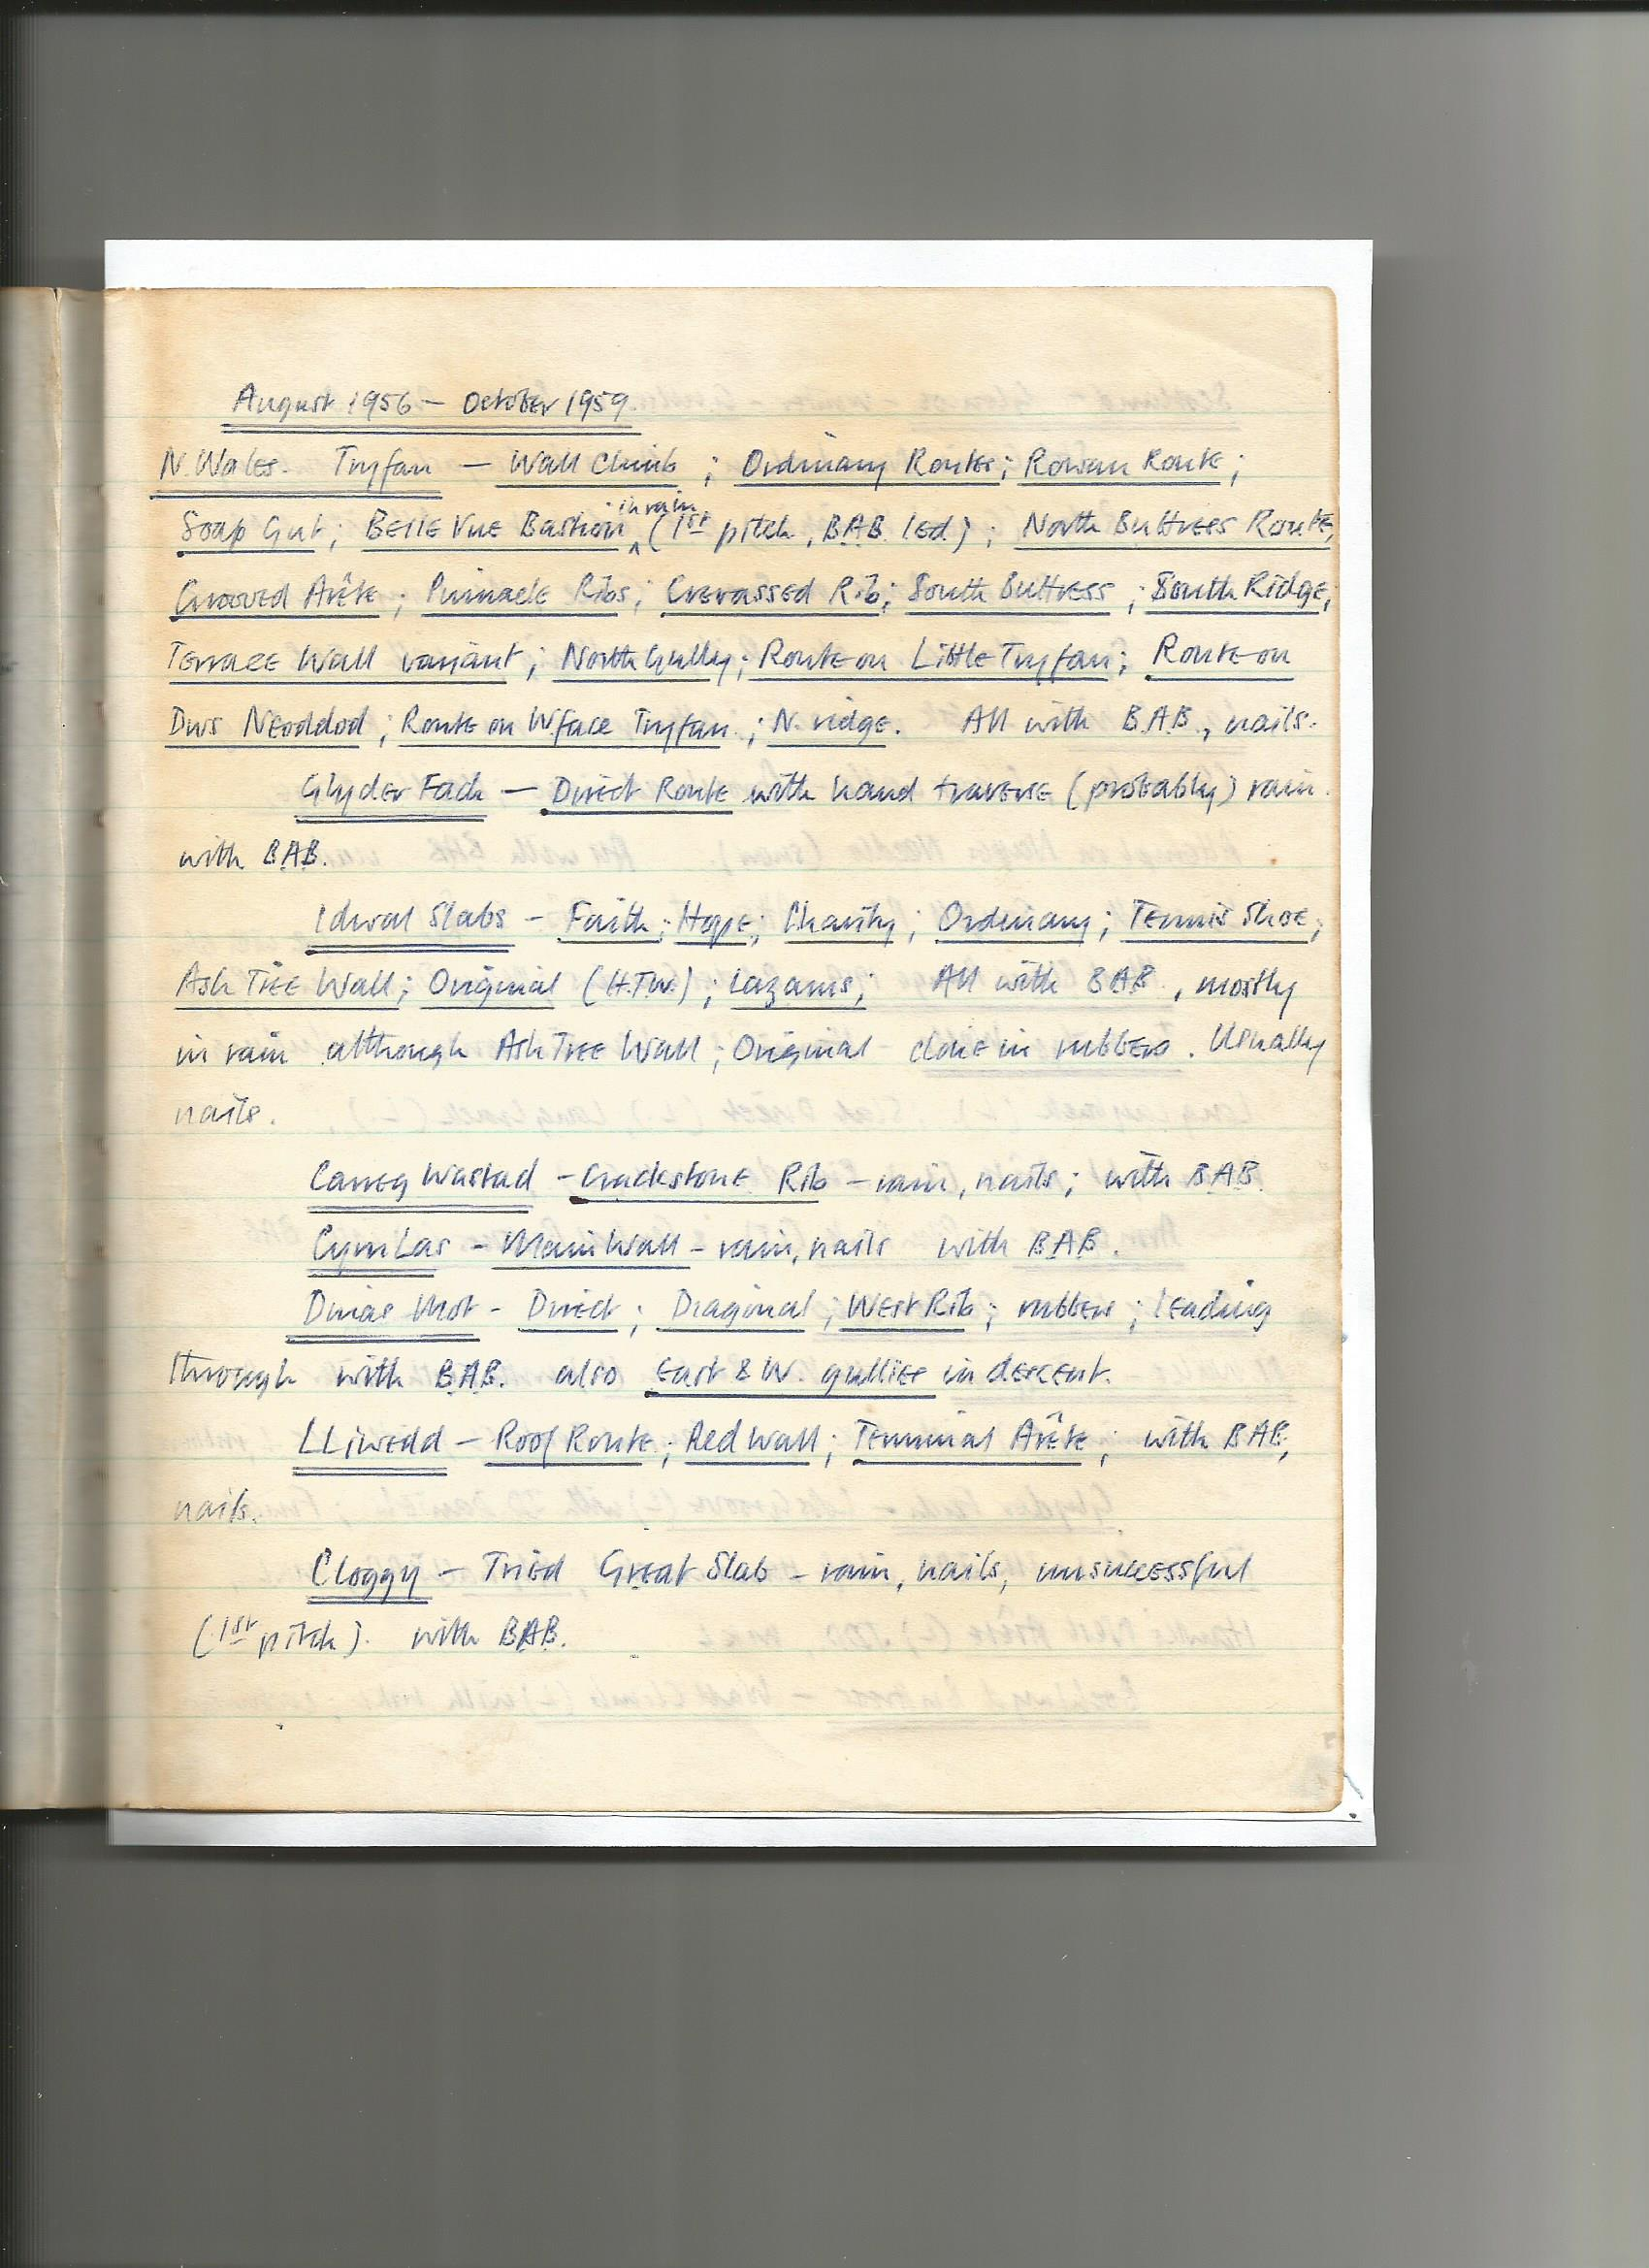 Barry Brewster Climbing Log August 1956 - October 1959